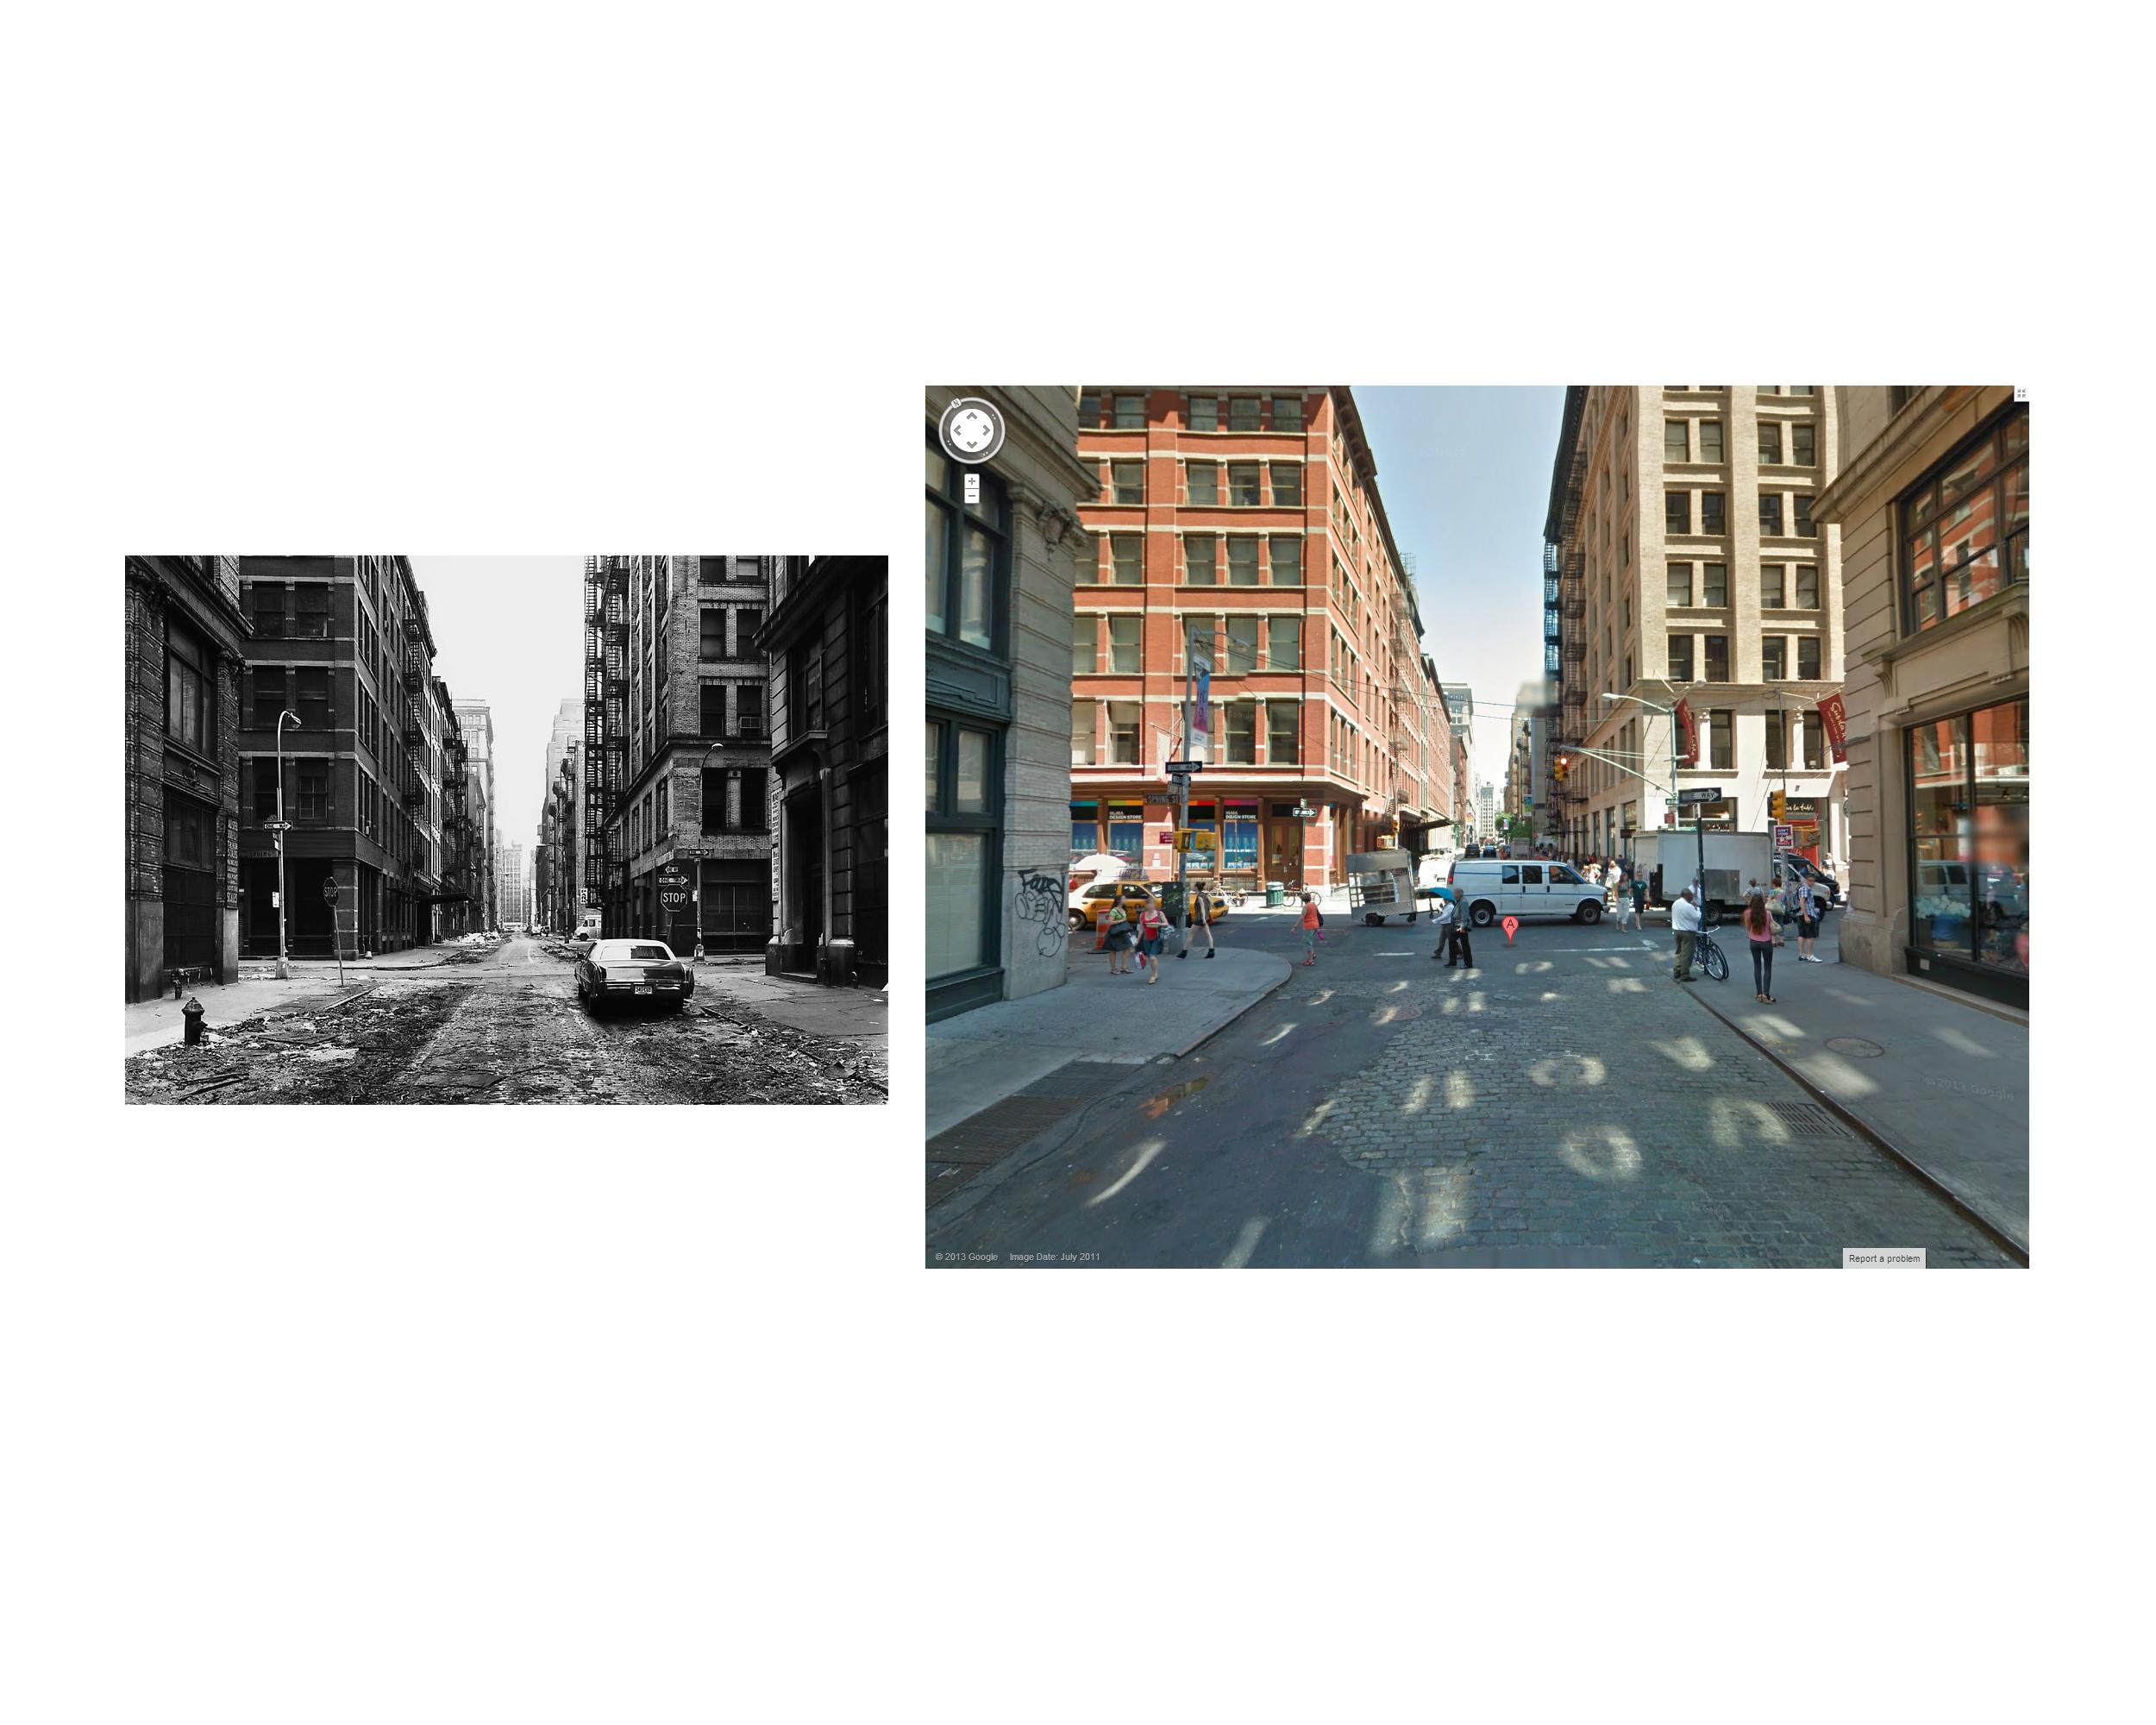 Thomas Struth, Crosby Street, New York City 1978